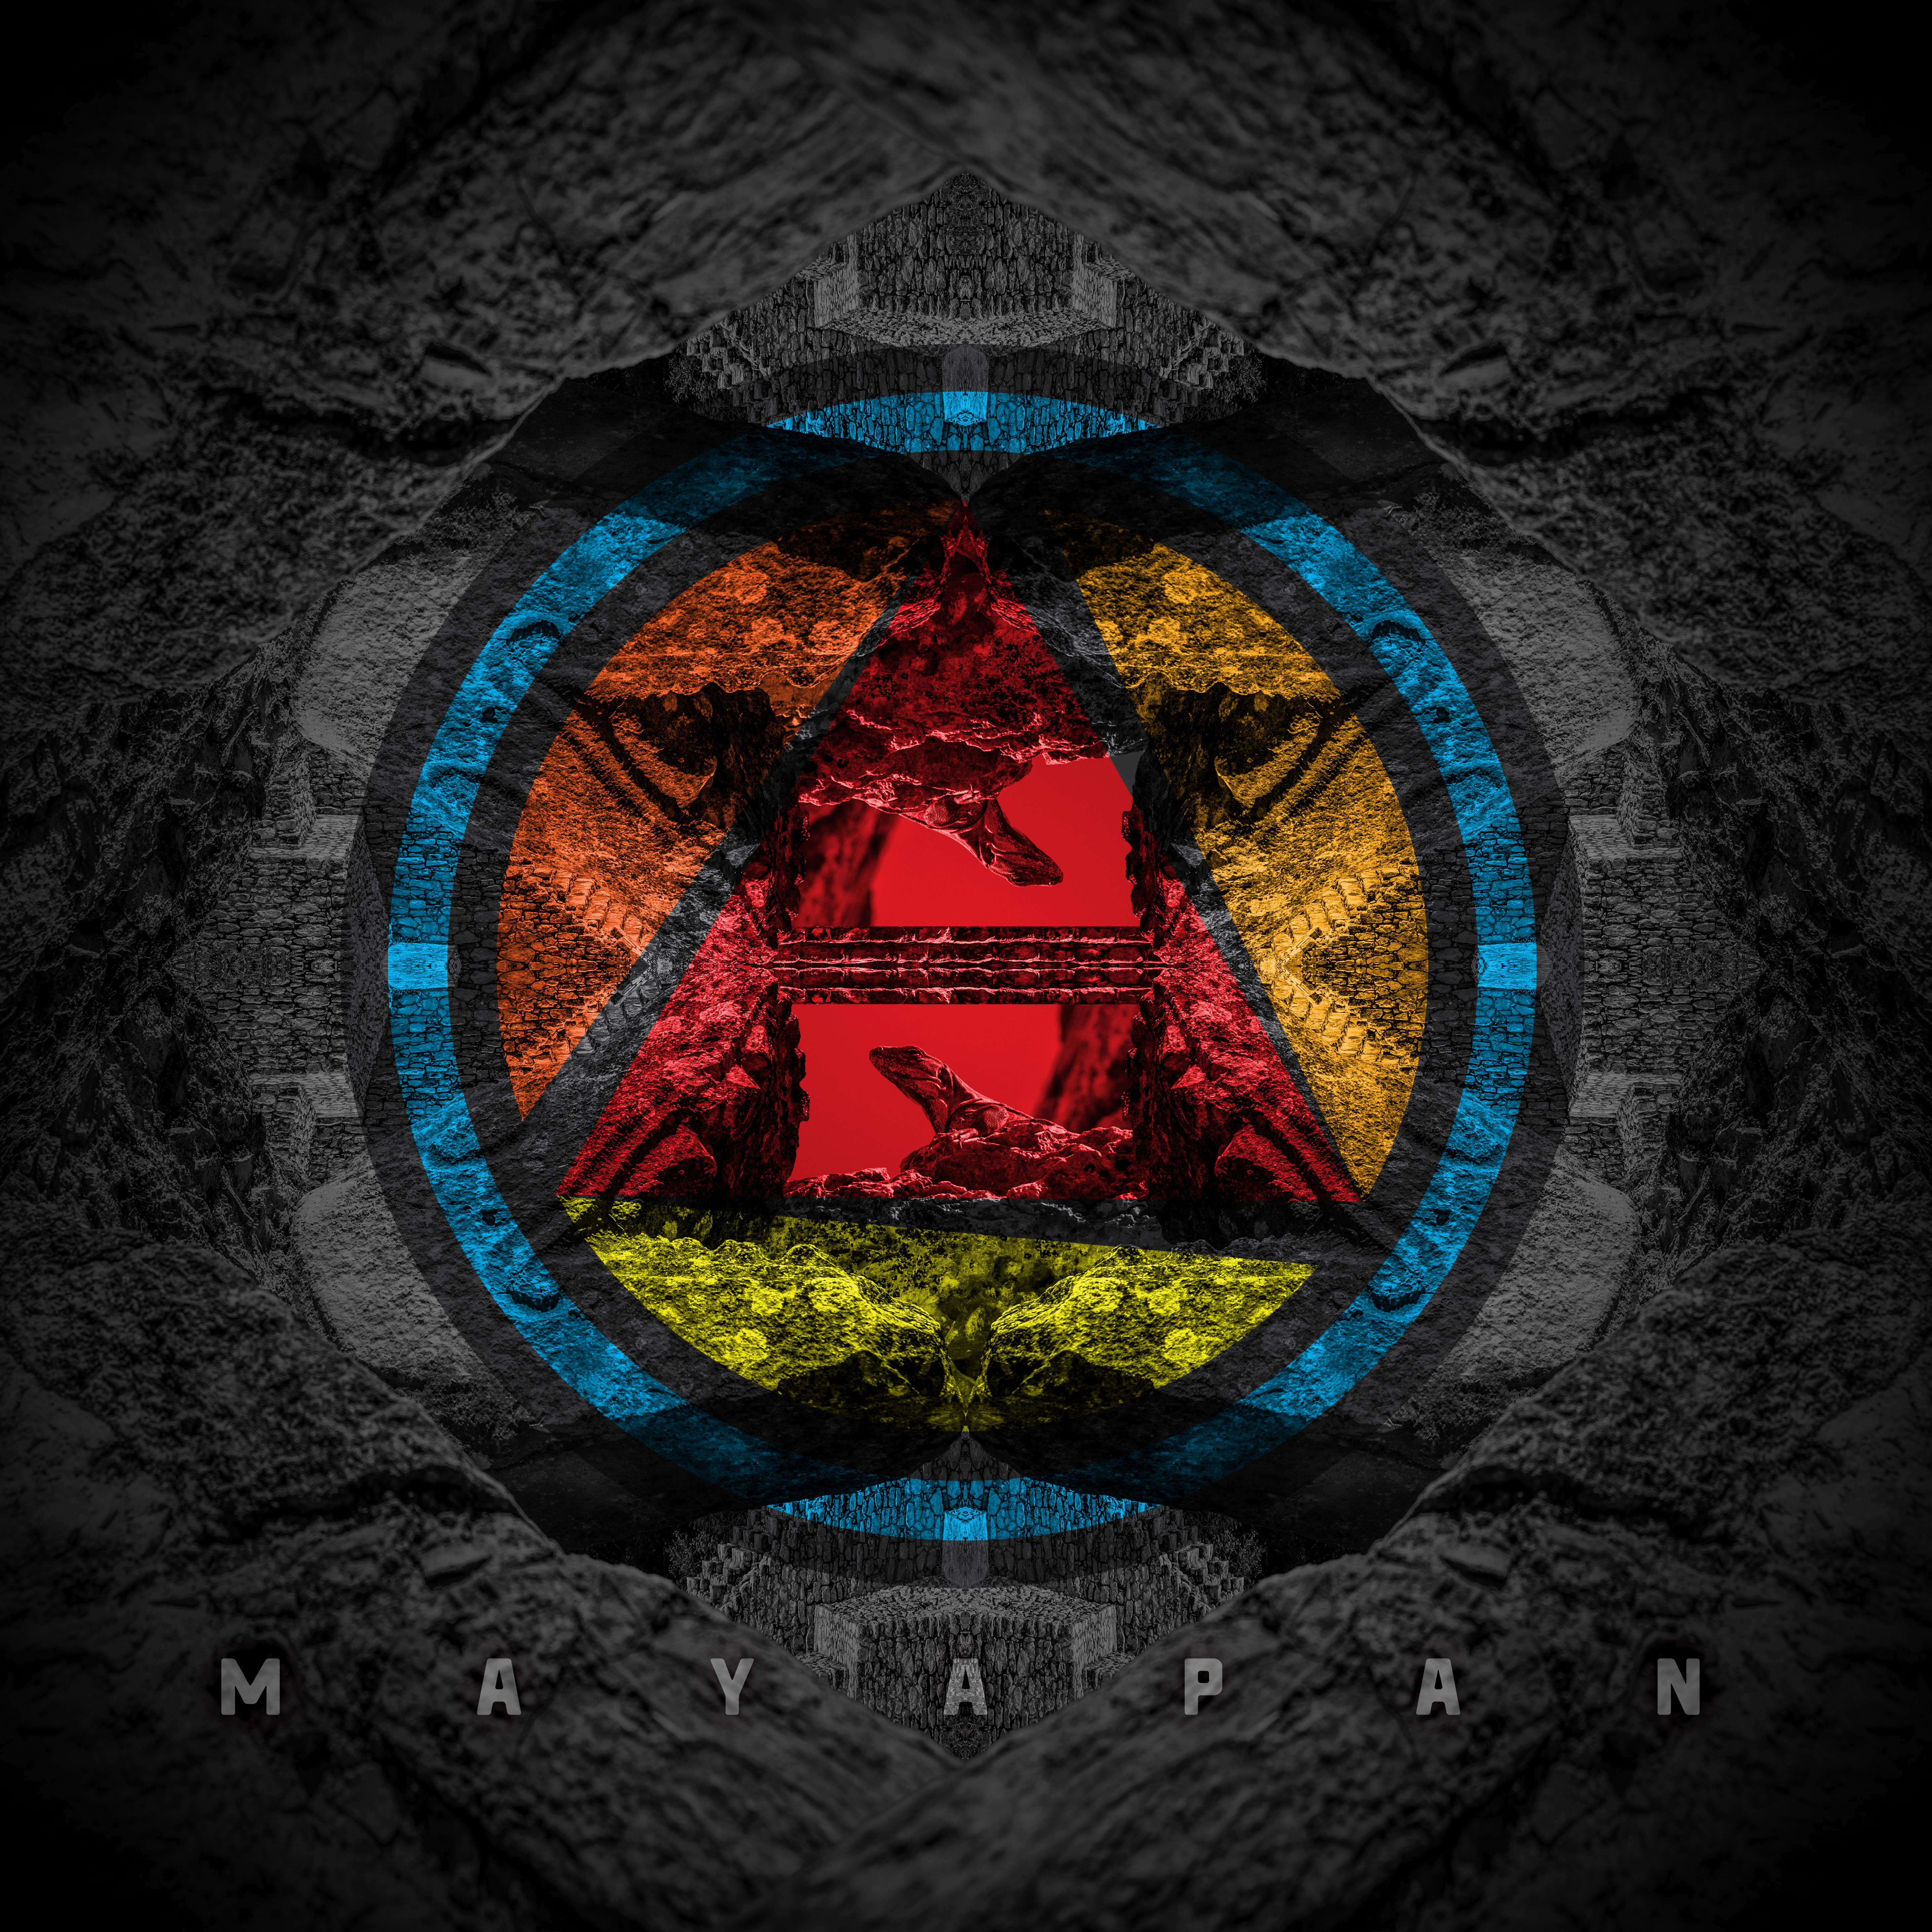 Mayapa cover